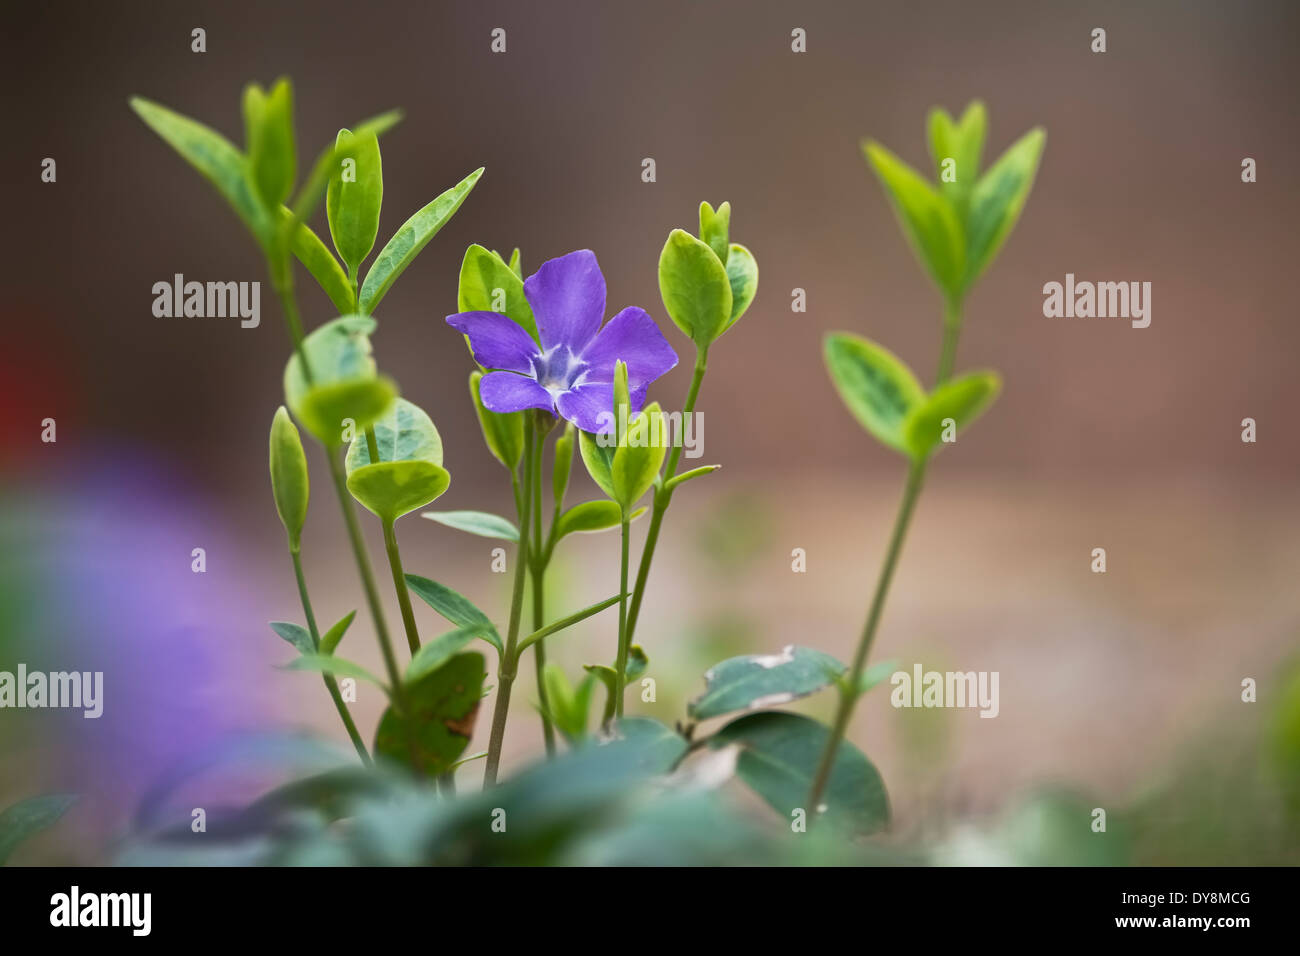 Vinca Bowles. Groundcover flowering Vine - Stock Image